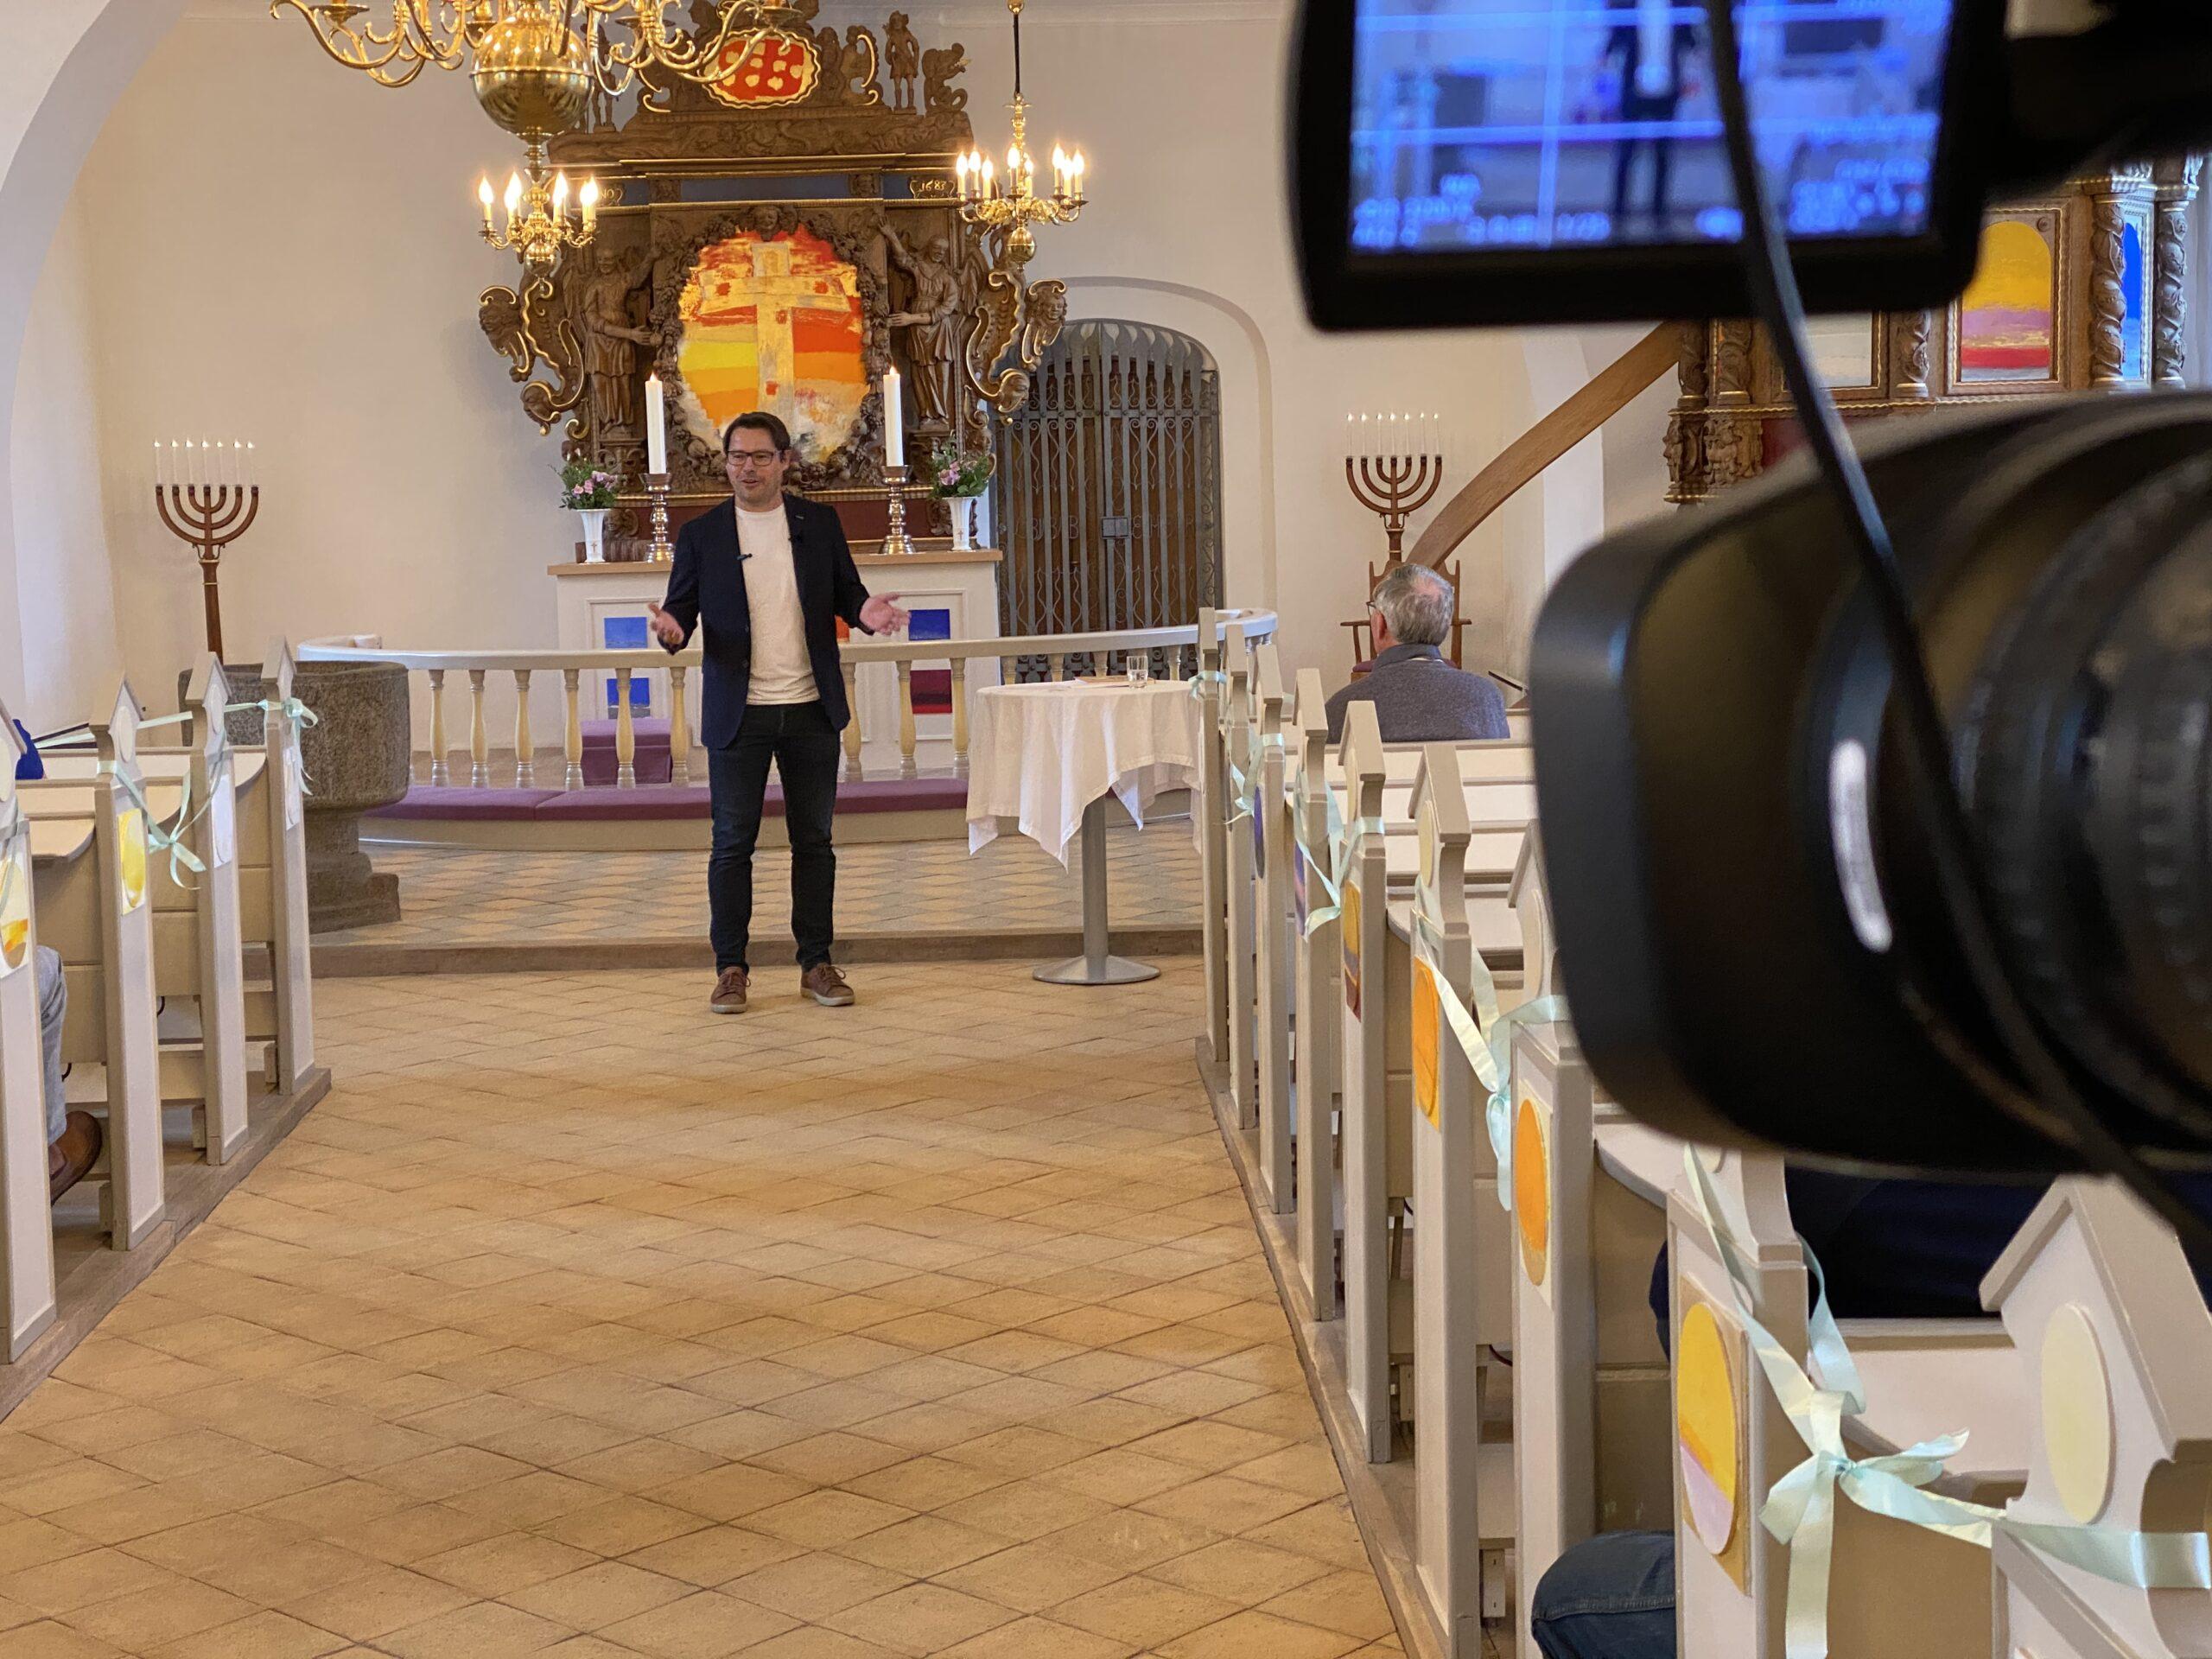 Taulov kirke fejrer 850-års jubilæum – foredrag om kirkernes historie